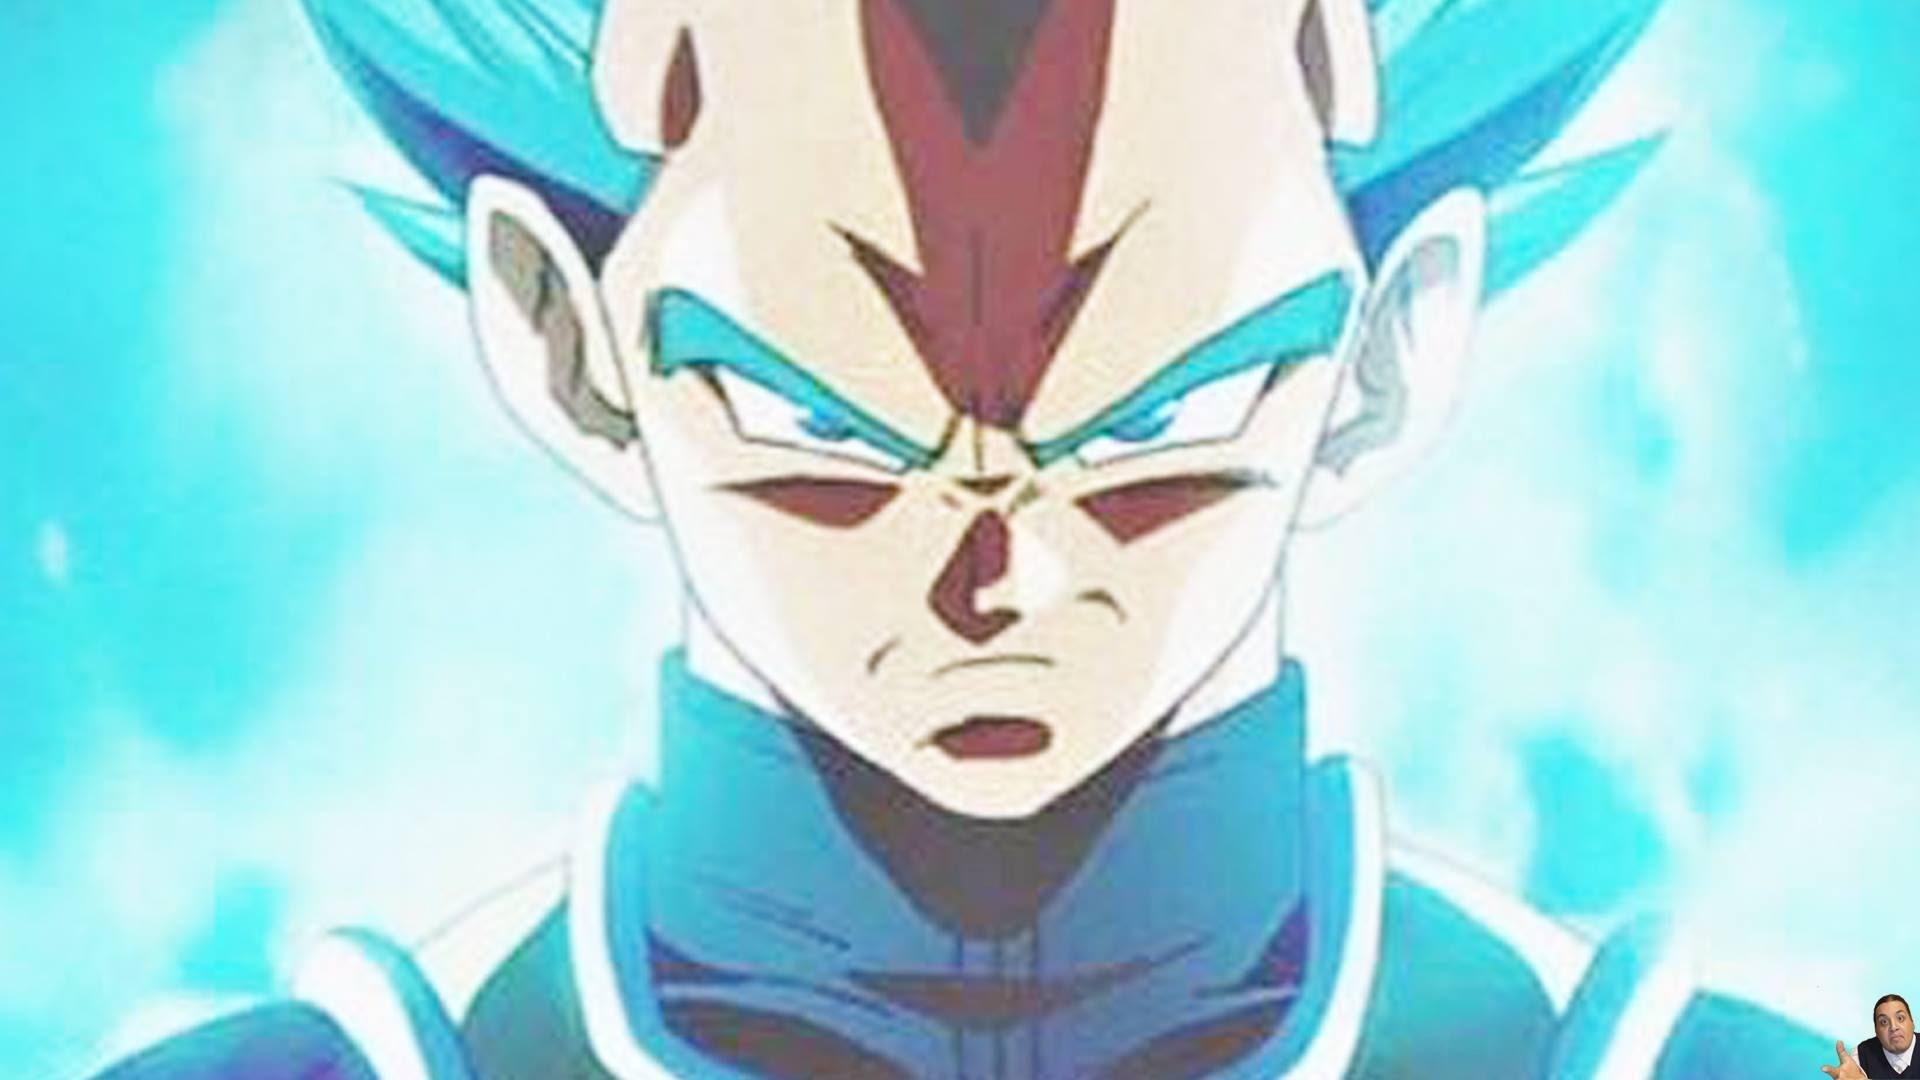 Dragon Ball Z Vegeta Super Saiyan God Super Saiyan